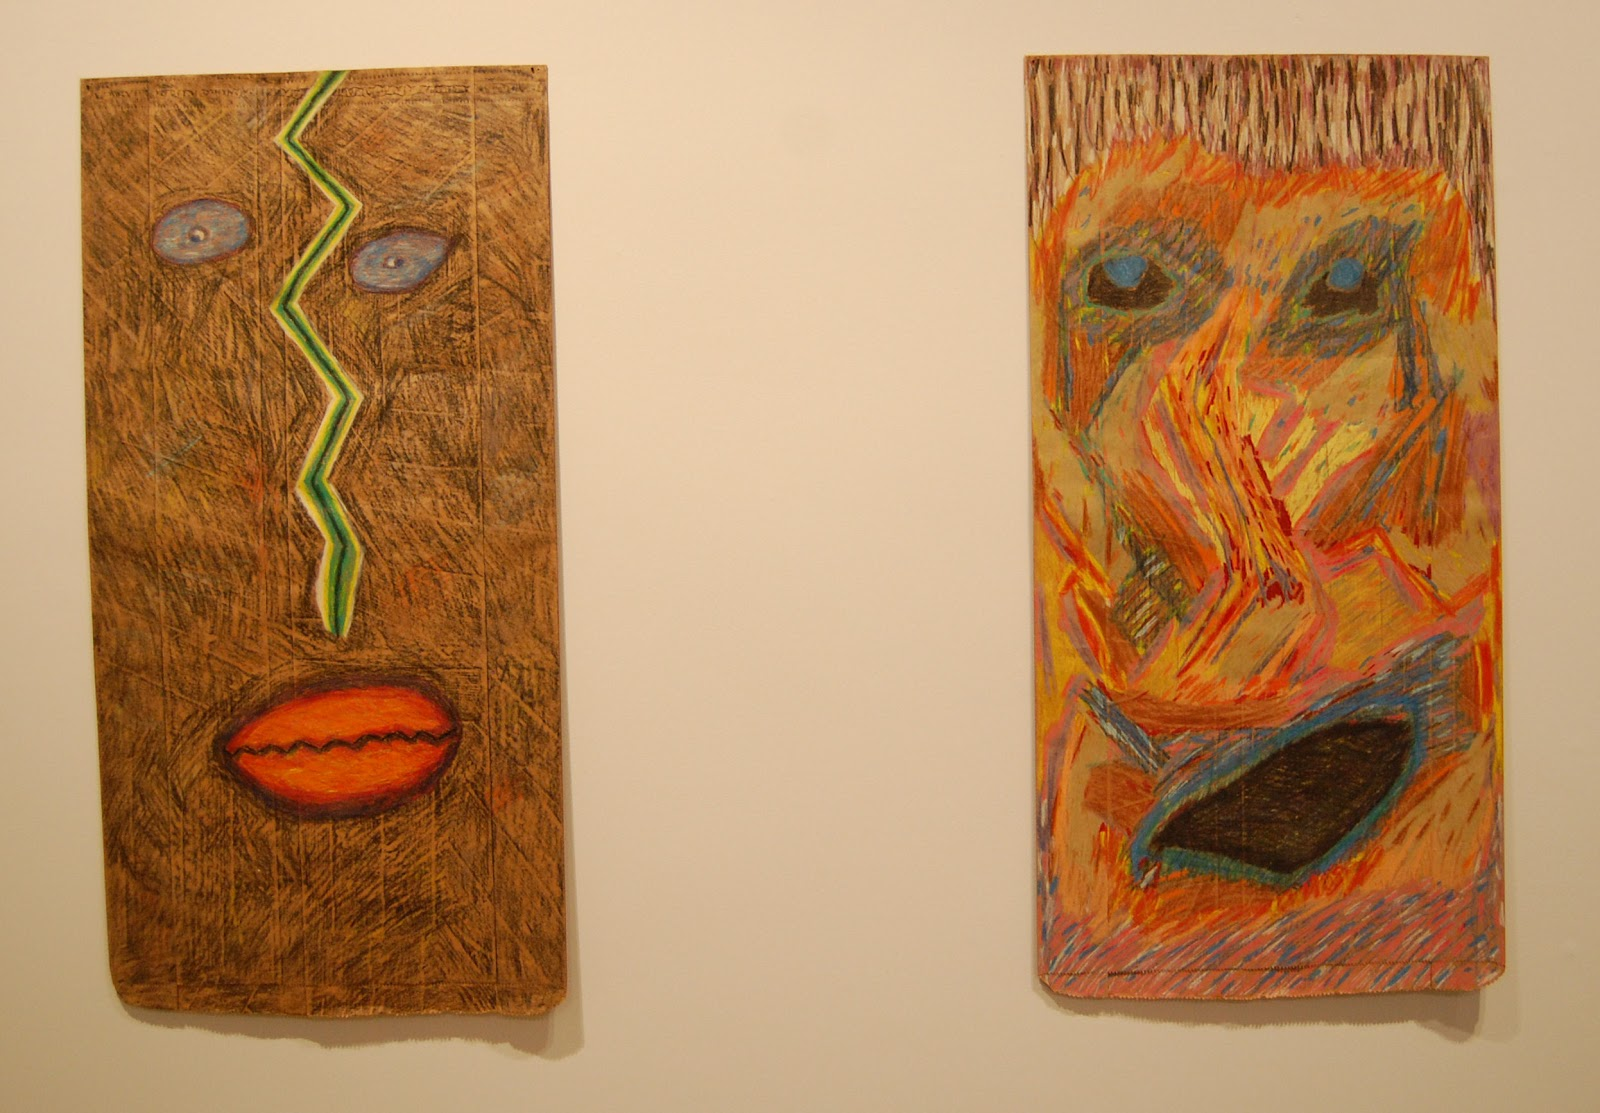 http://2.bp.blogspot.com/-iBnYOXGrbZo/T1882YmmuaI/AAAAAAAABcE/PrGtHcs64OU/s1600/171+Paper+Bag+Faces+by+Rafael+Ferrer,+1977.JPG